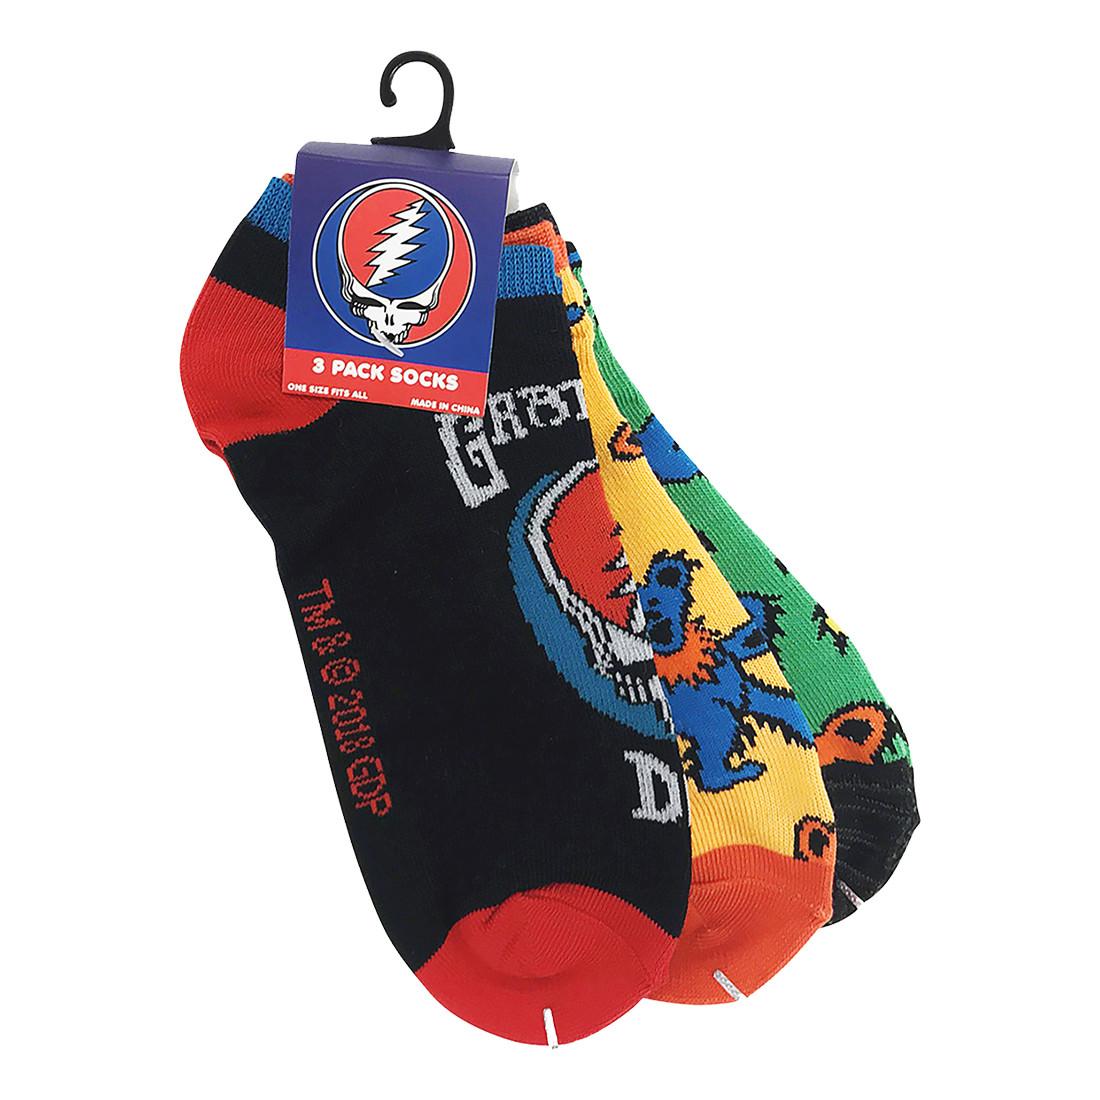 Grateful Dead 3 Pack Ankle Socks